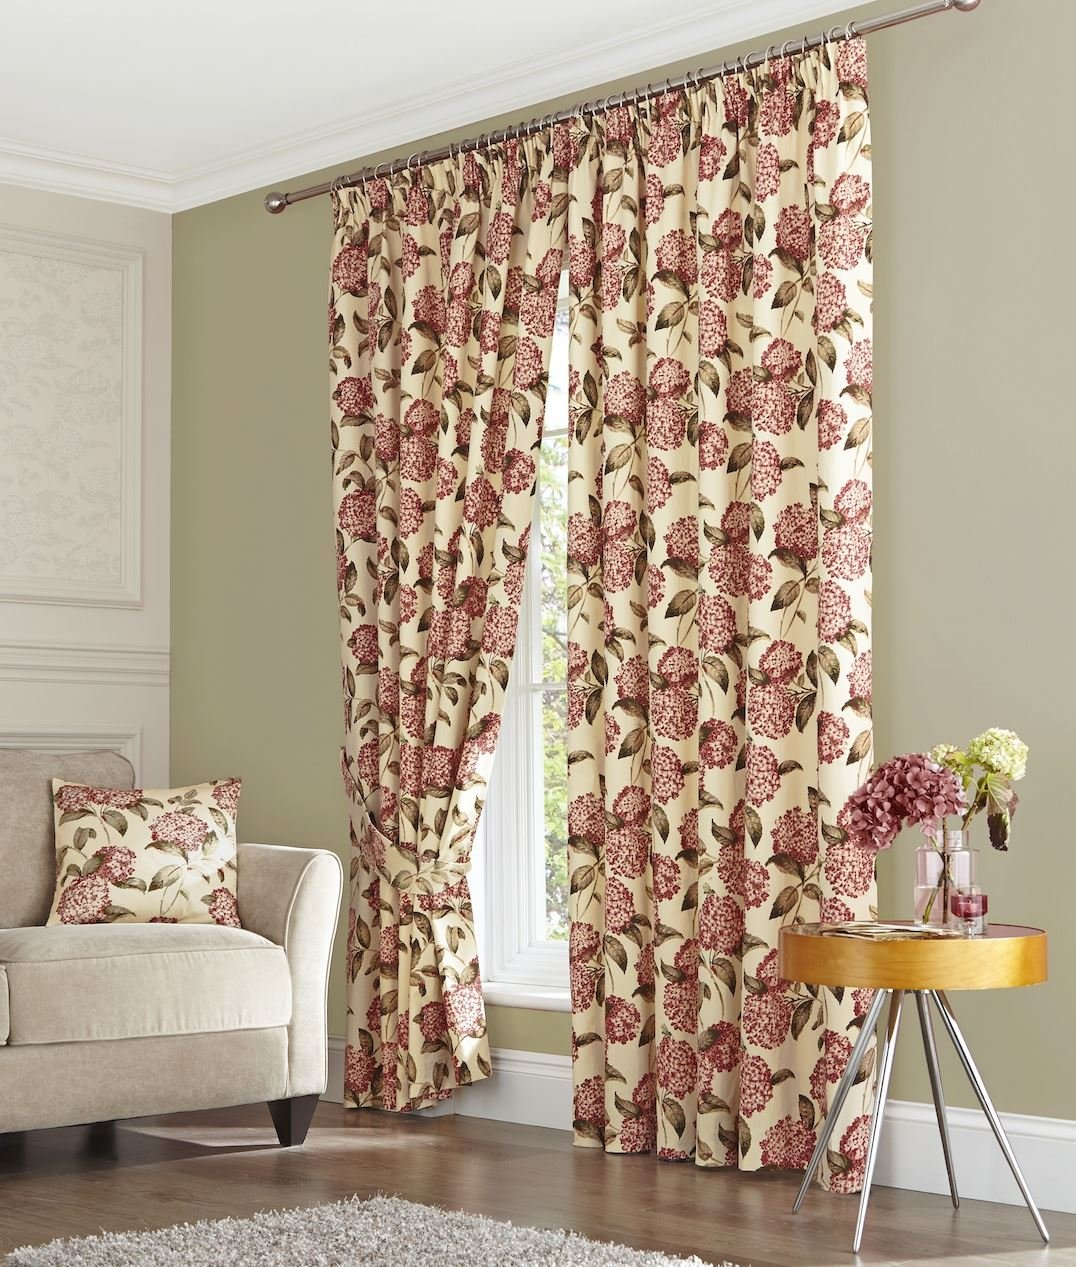 vorhnge romantisch trendy romantische lila vorhnge im with vorhnge romantisch simple mode. Black Bedroom Furniture Sets. Home Design Ideas